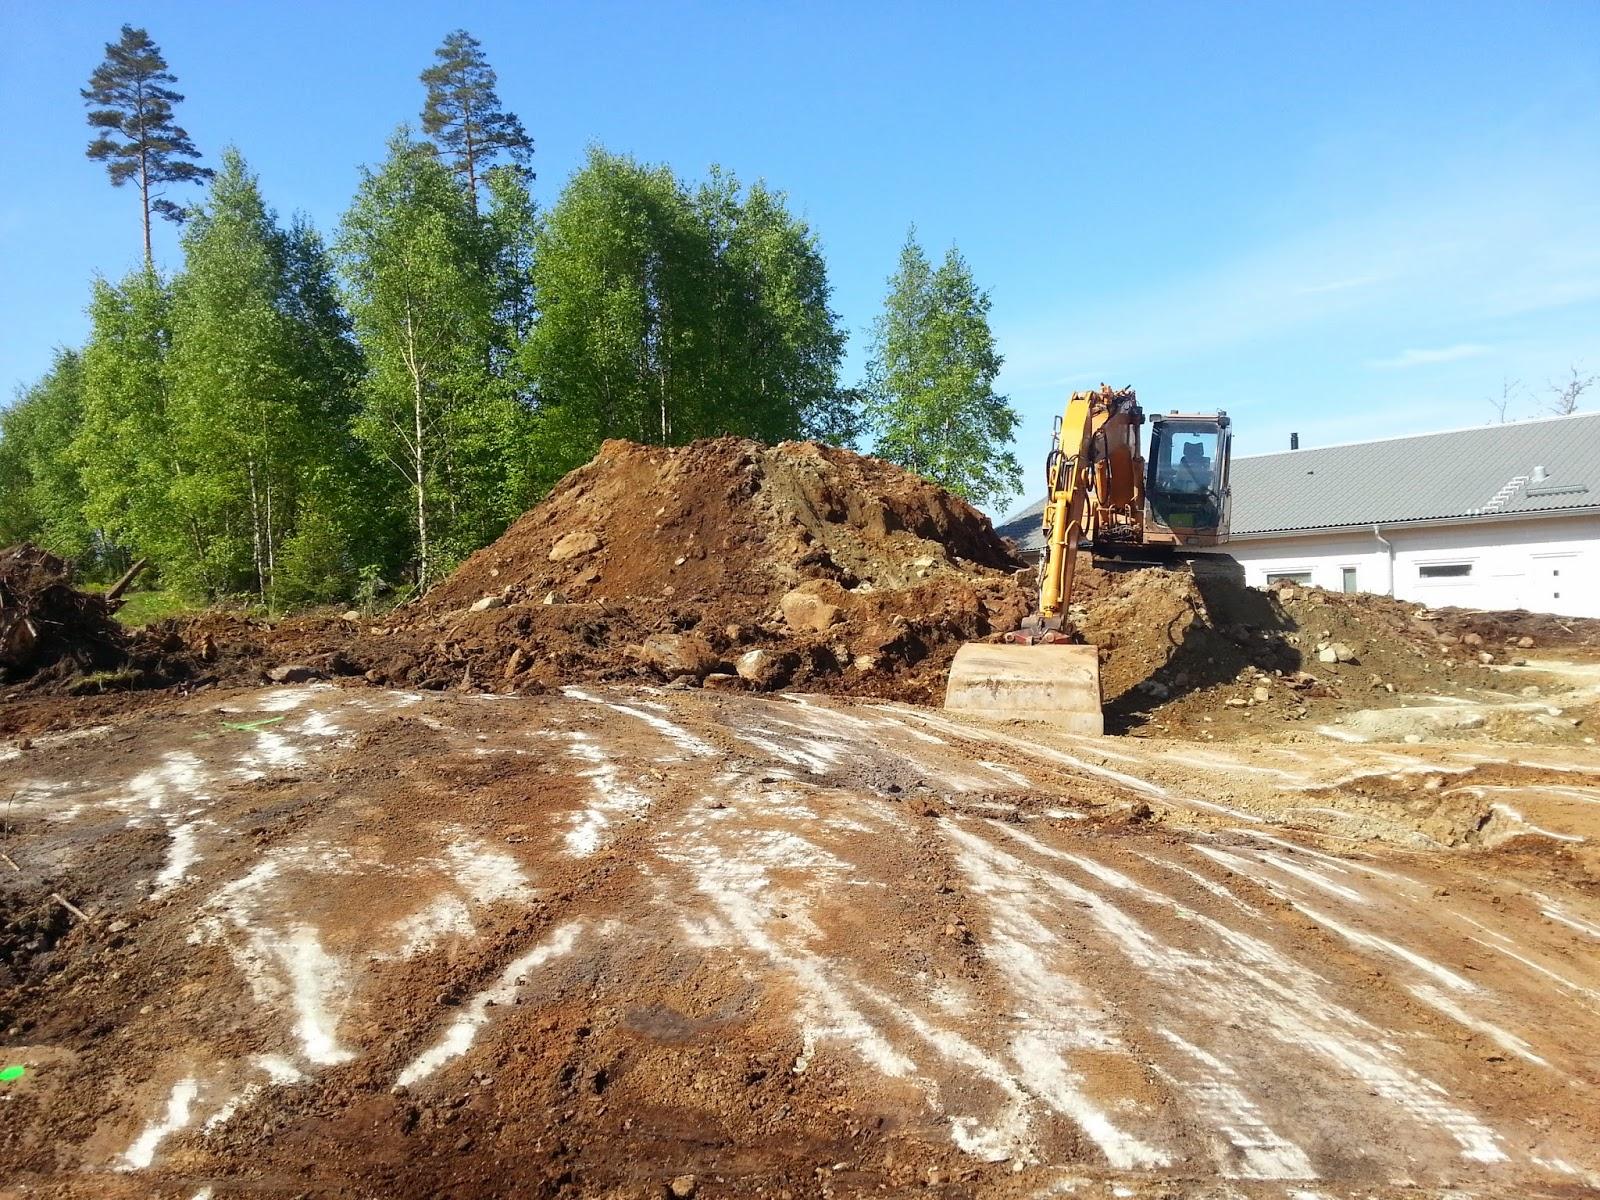 VÃ¥rt hus blir till: maj 2014